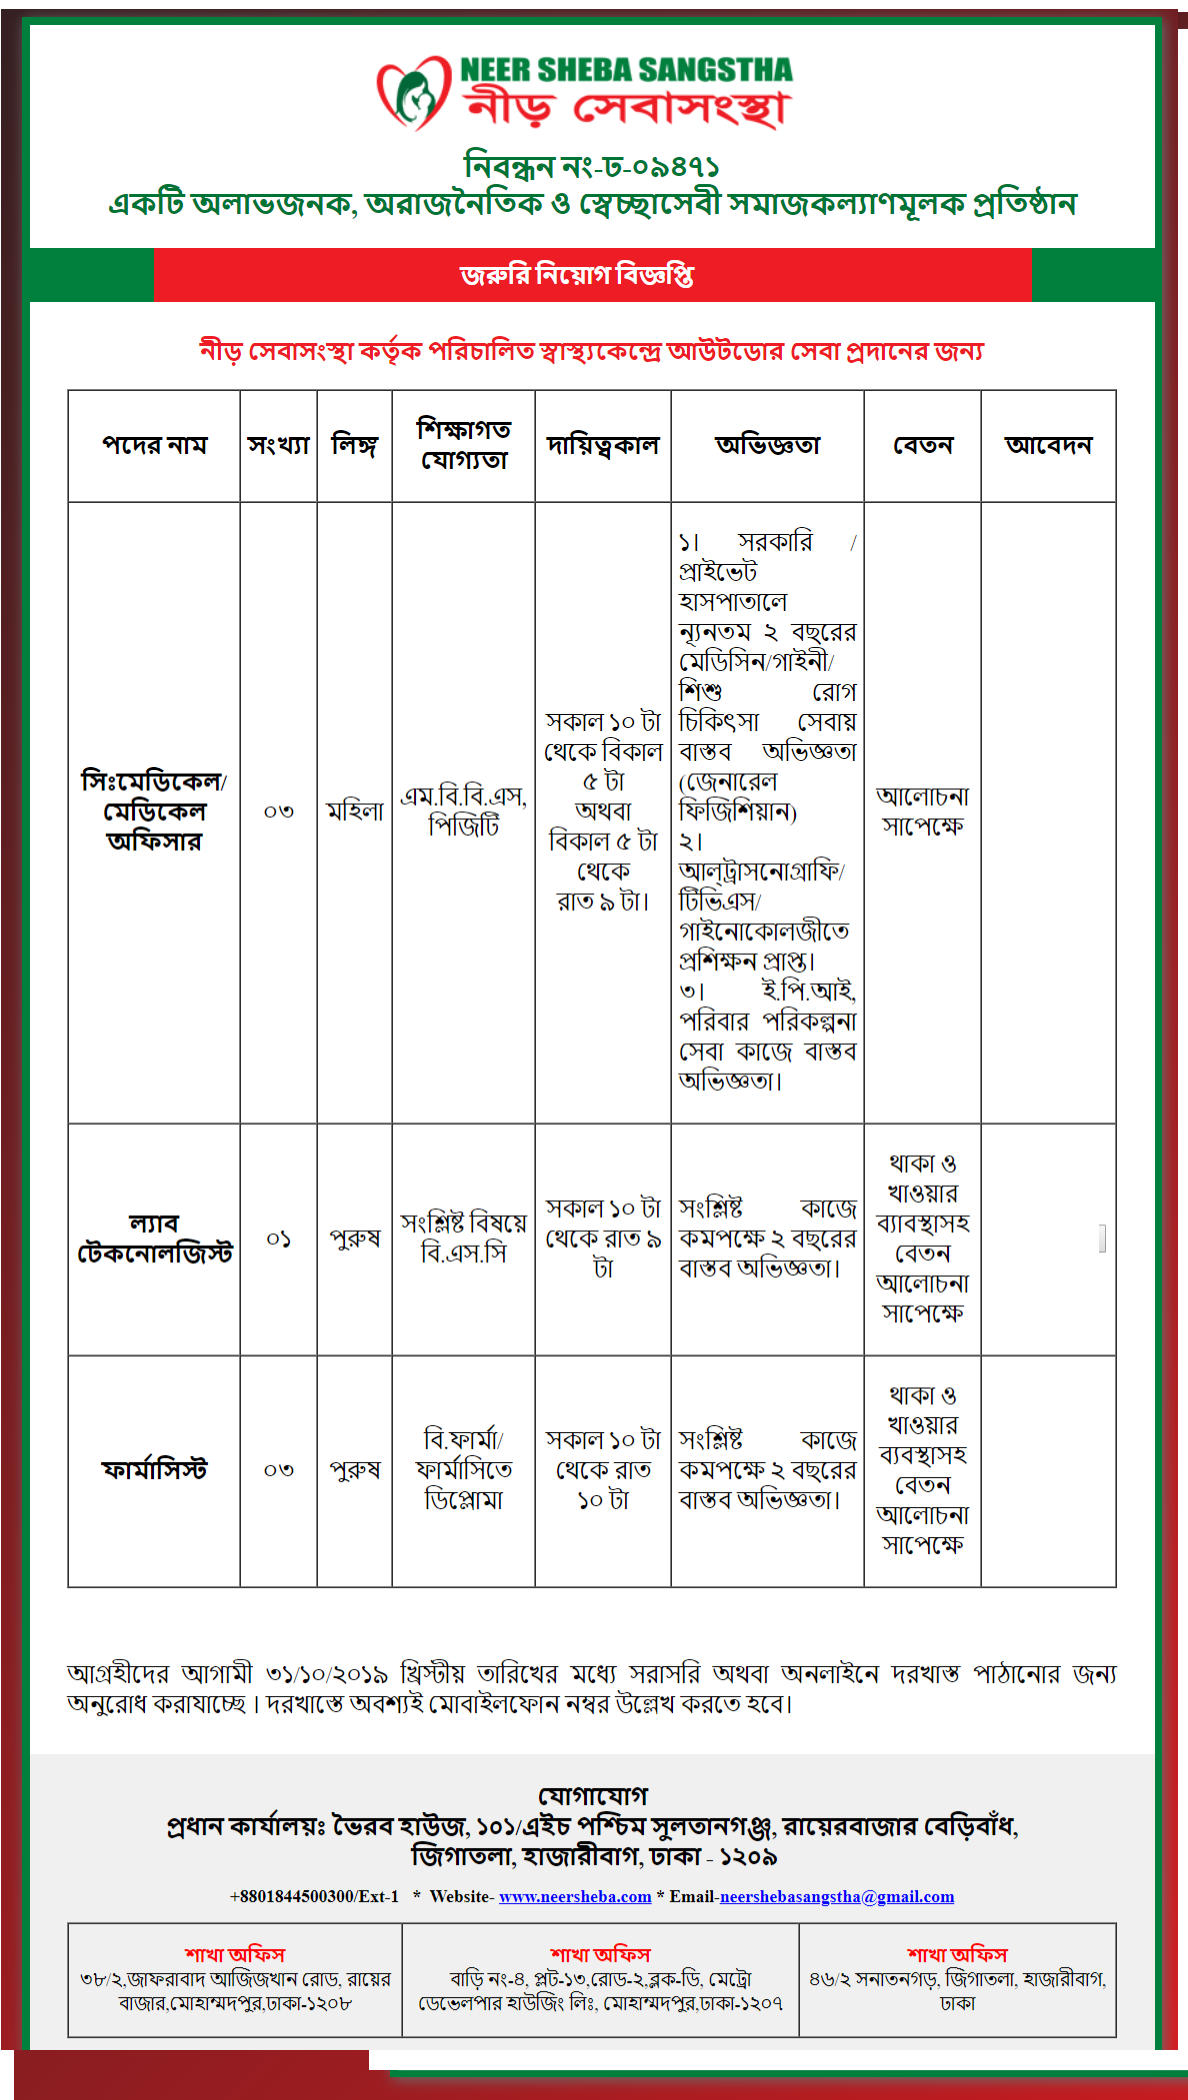 Neer Sheba Sangstha Job Circular 2019